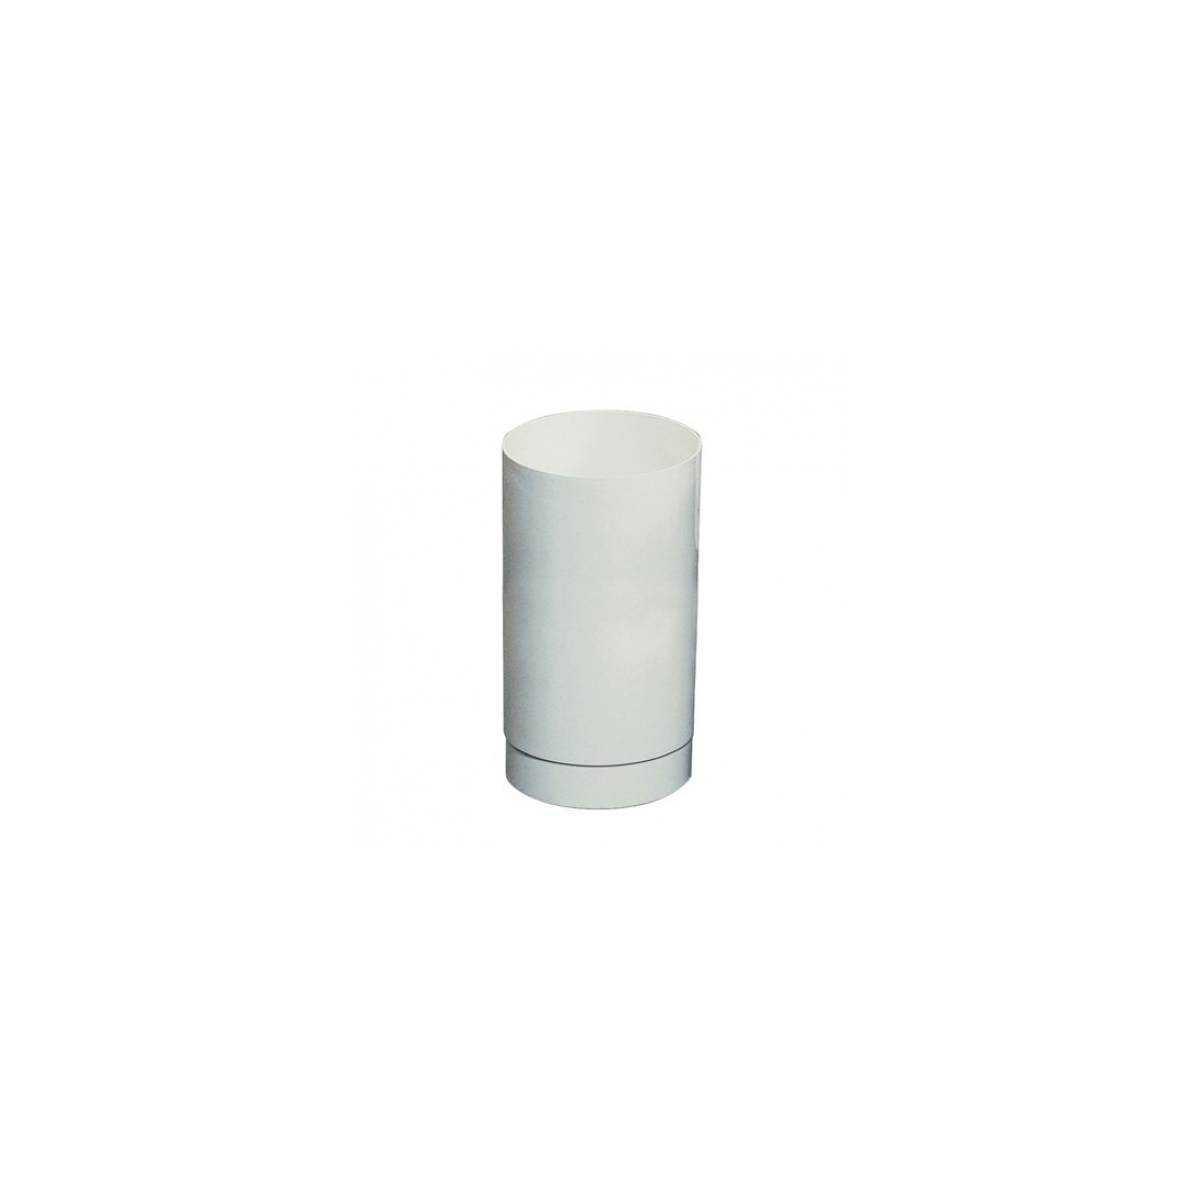 Урна для мусора 24л ACQUALBA (A82201) A82201 Mar Plast